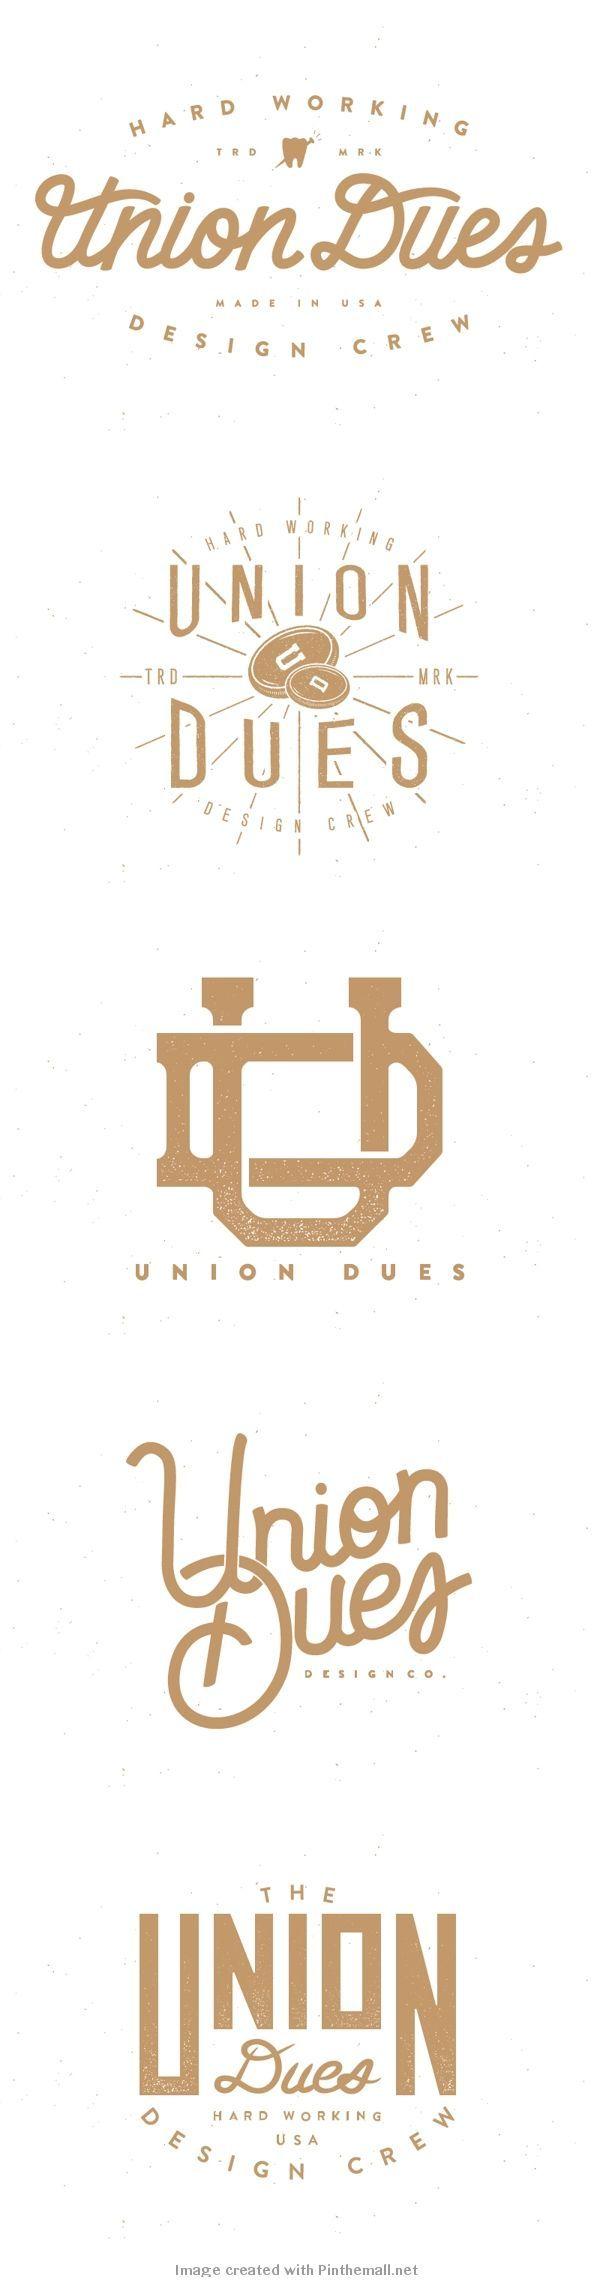 Logo type design hand lettering gold white vintage union dues